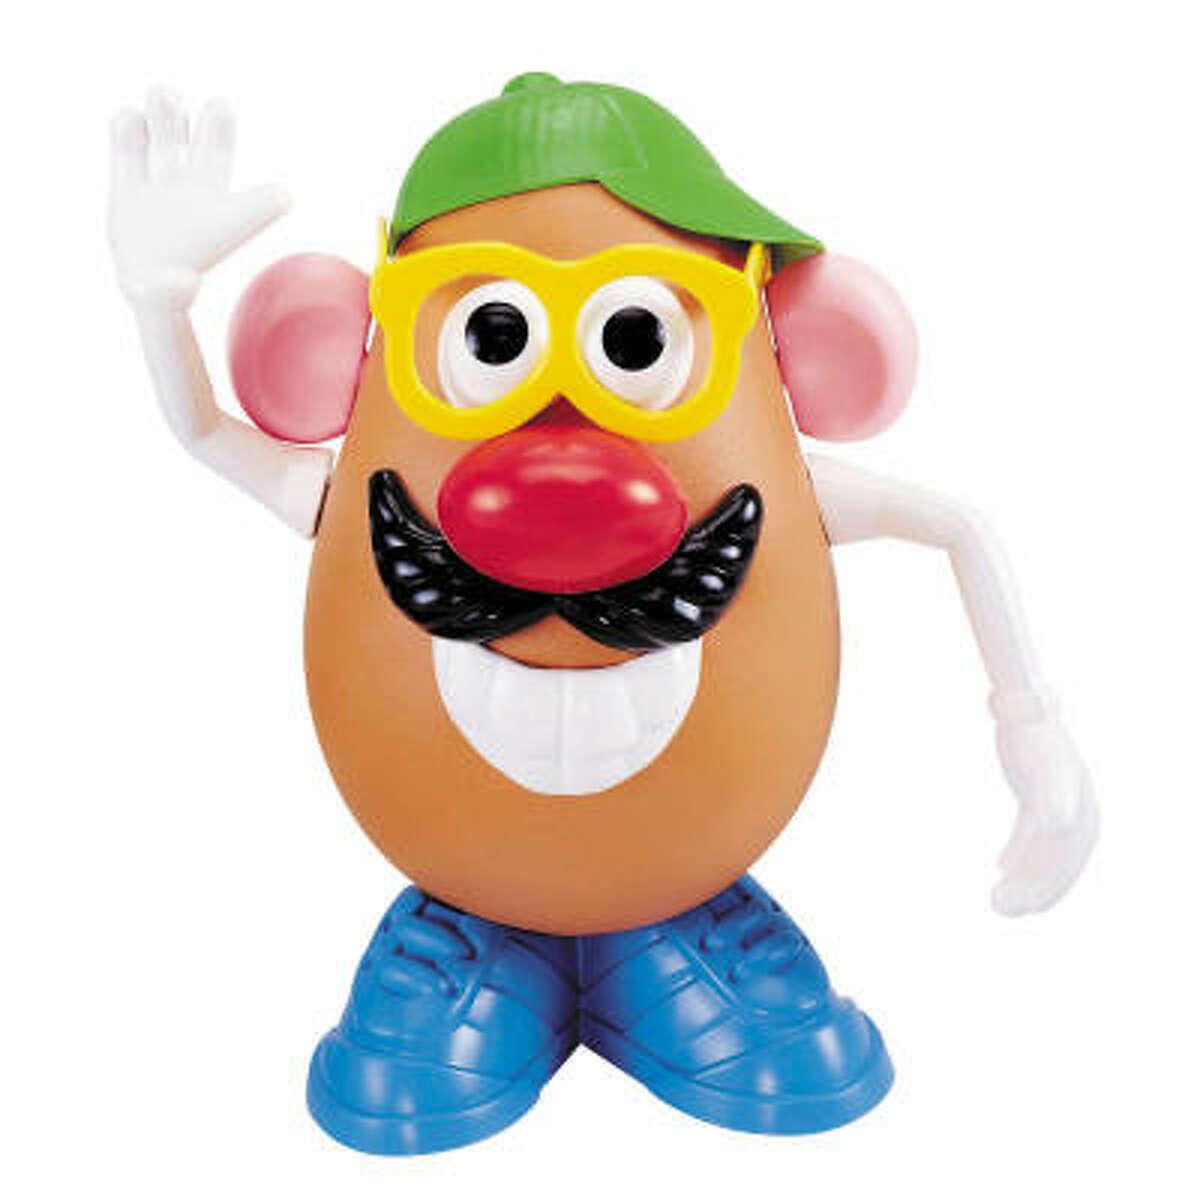 Mr. Potato Head - b.1949